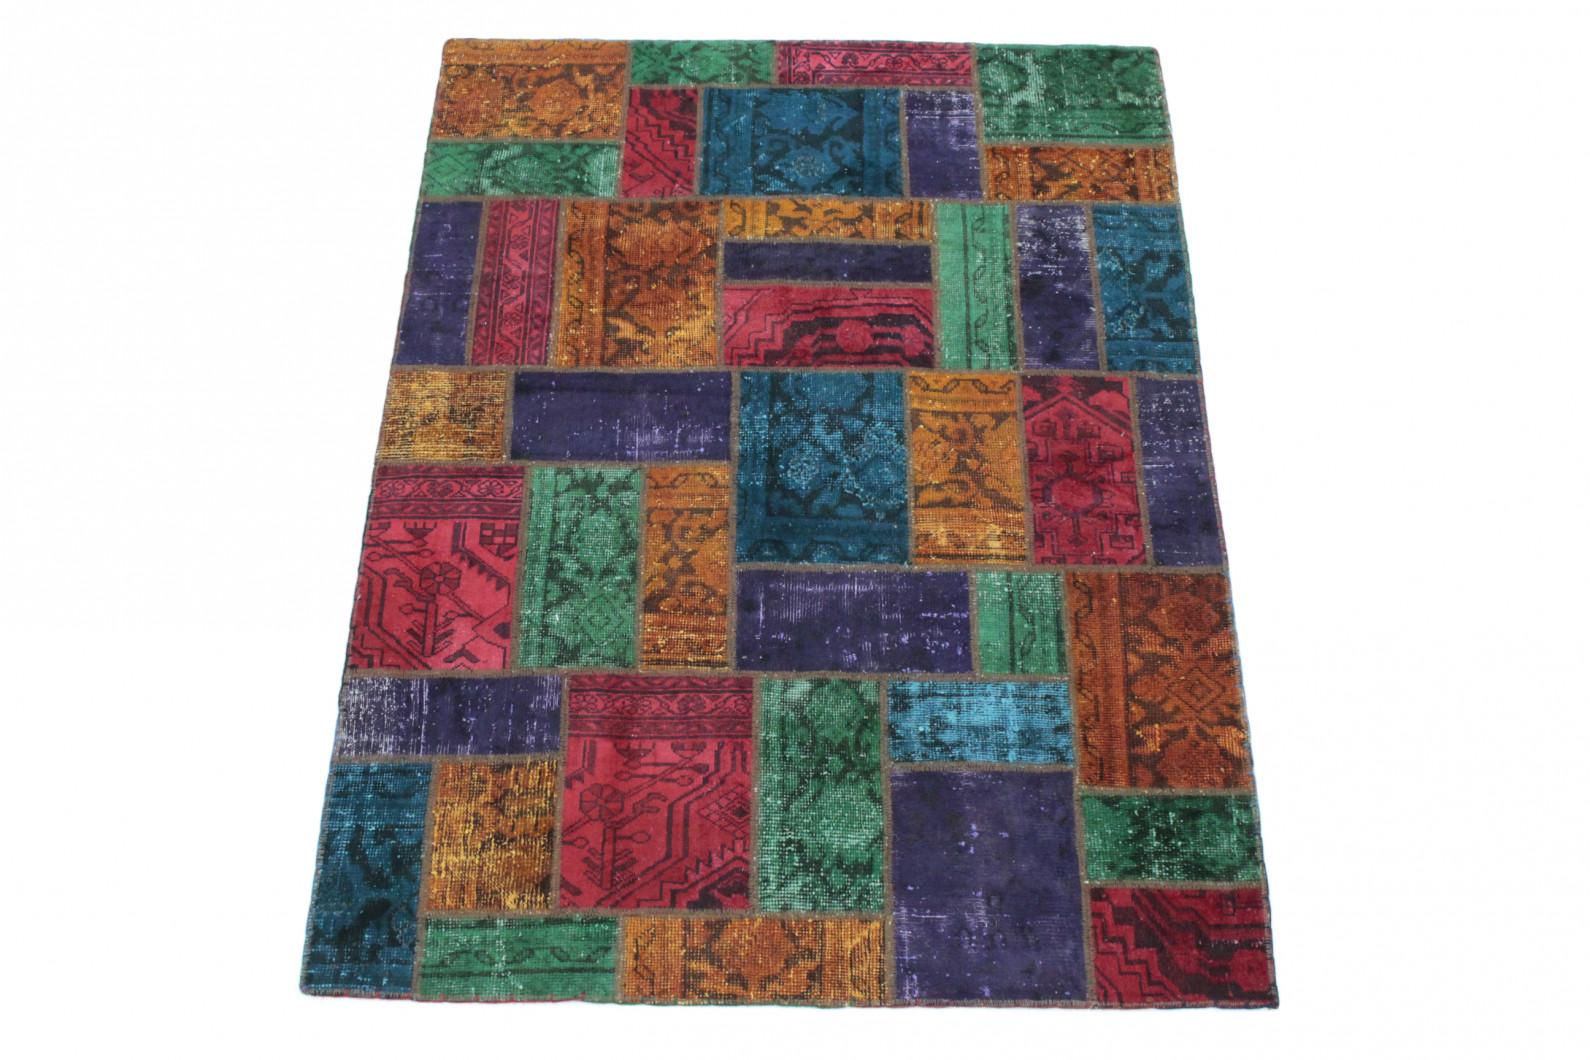 patchwork teppich lila gr n orange rot in 200x150 1001 167076 bei kaufen. Black Bedroom Furniture Sets. Home Design Ideas